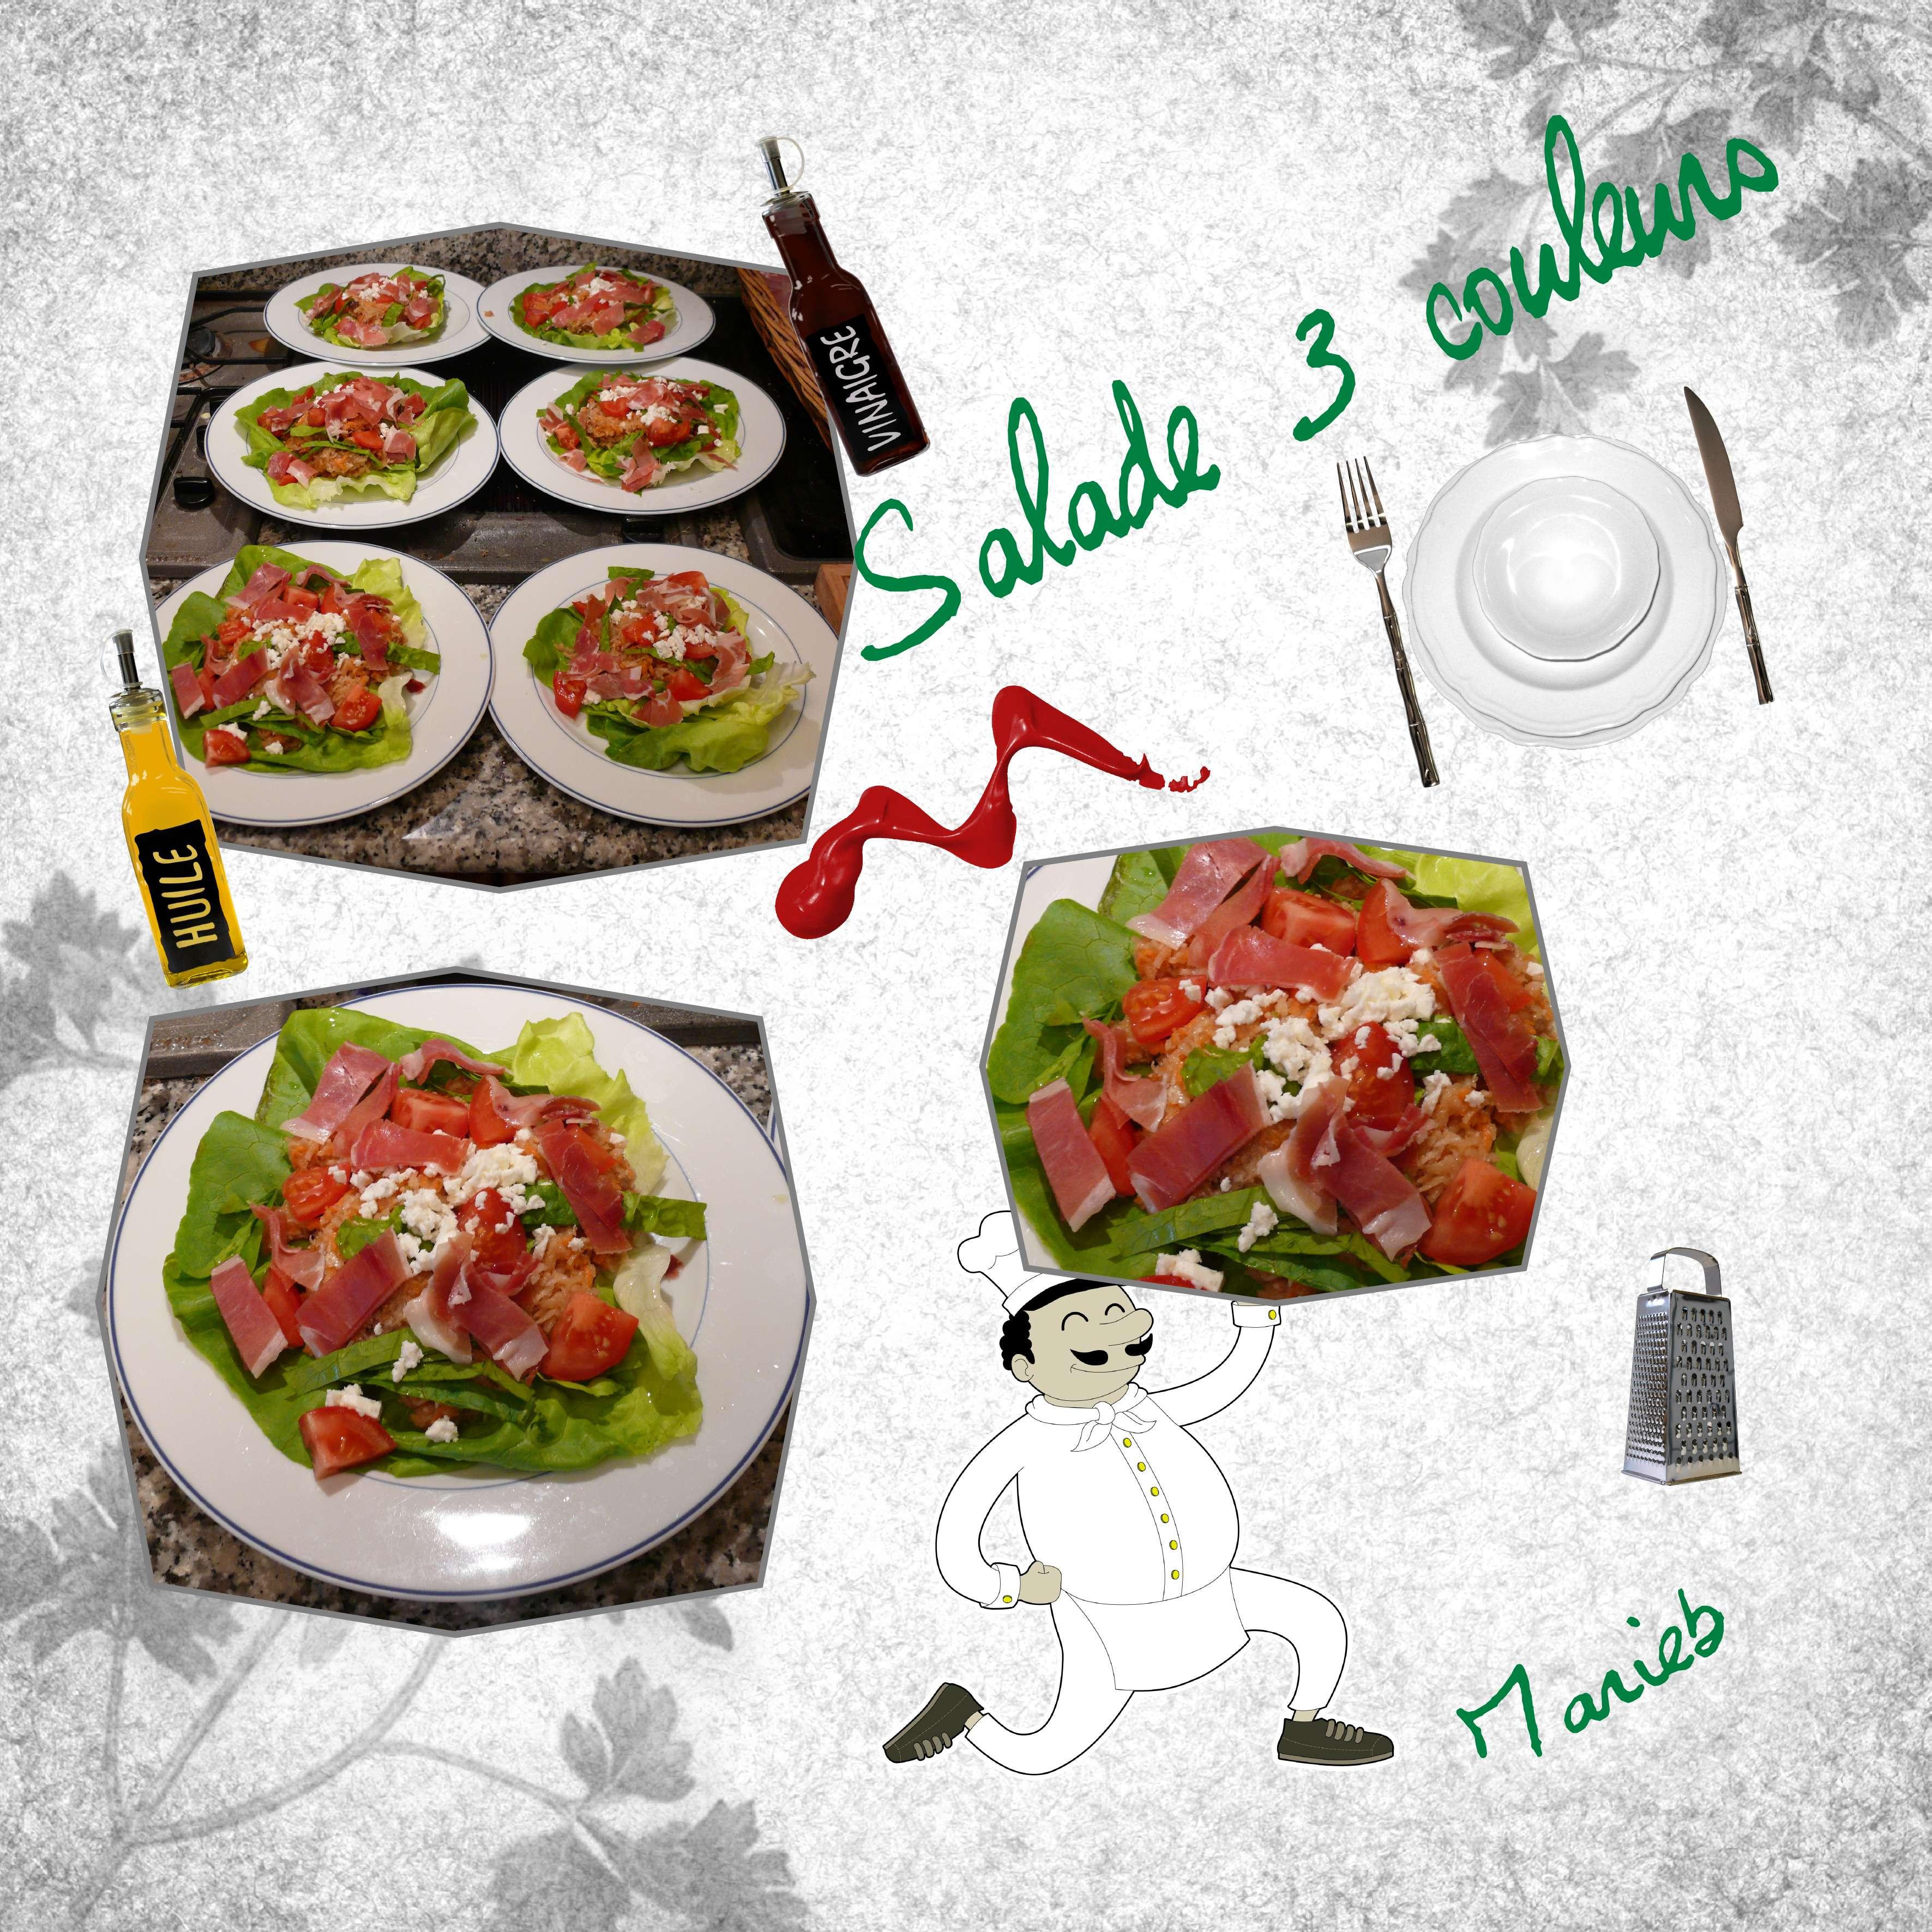 salade3couleurs.jpg